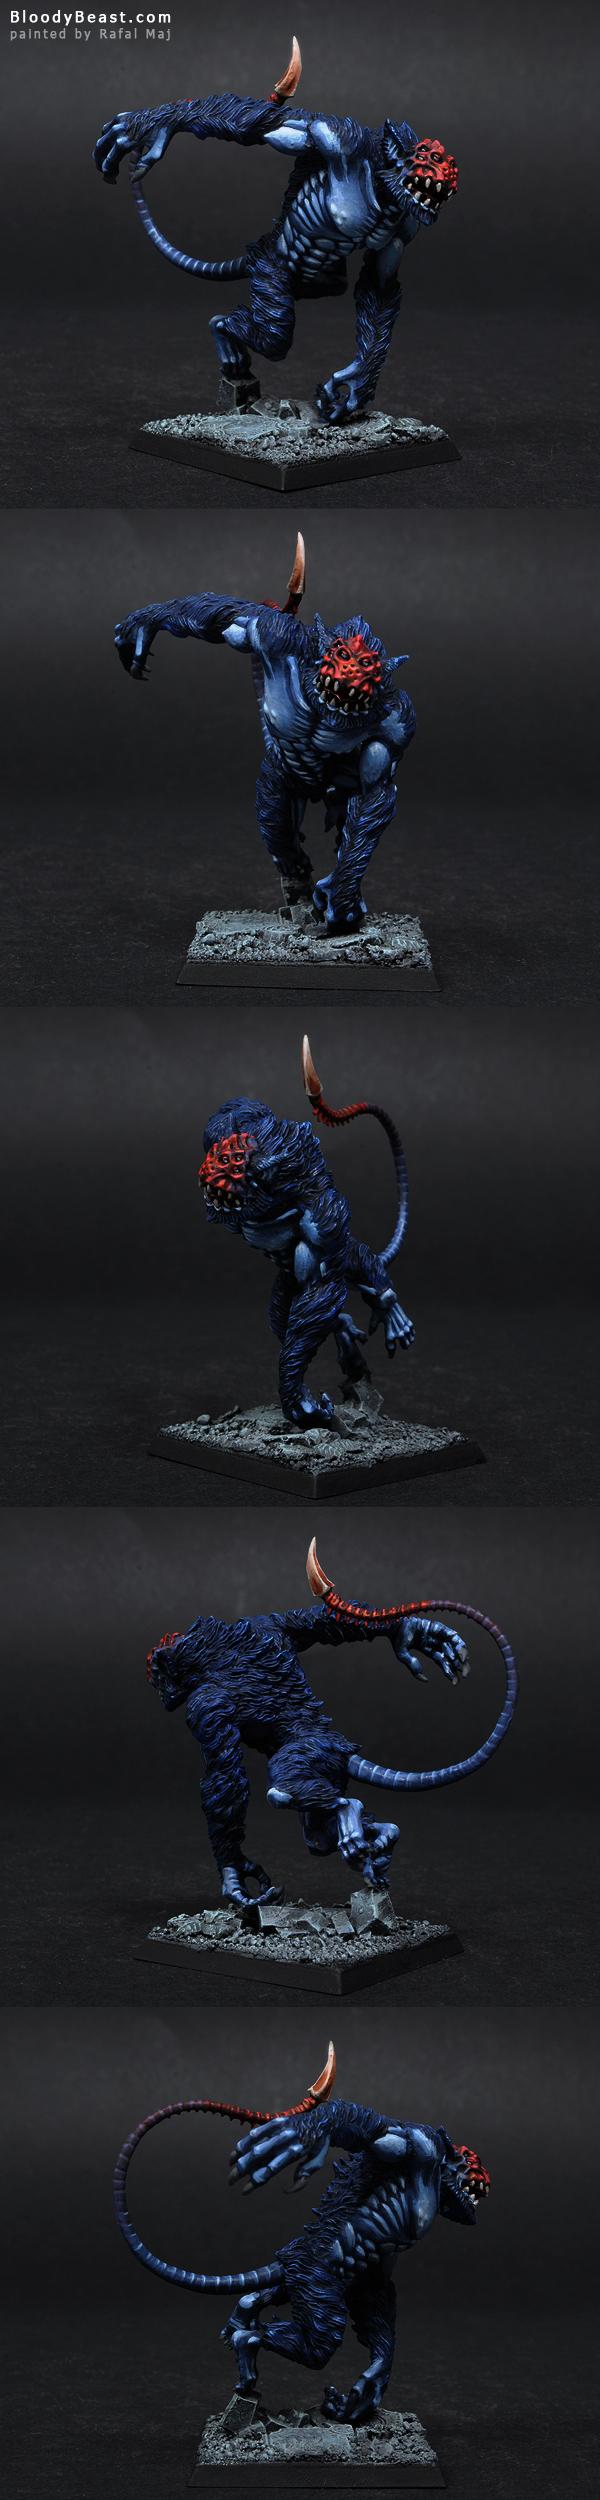 Dark Eldar Clawed Fiend as Darkreach Zeshin Nightcreeper painted by Rafal Maj (BloodyBeast.com)